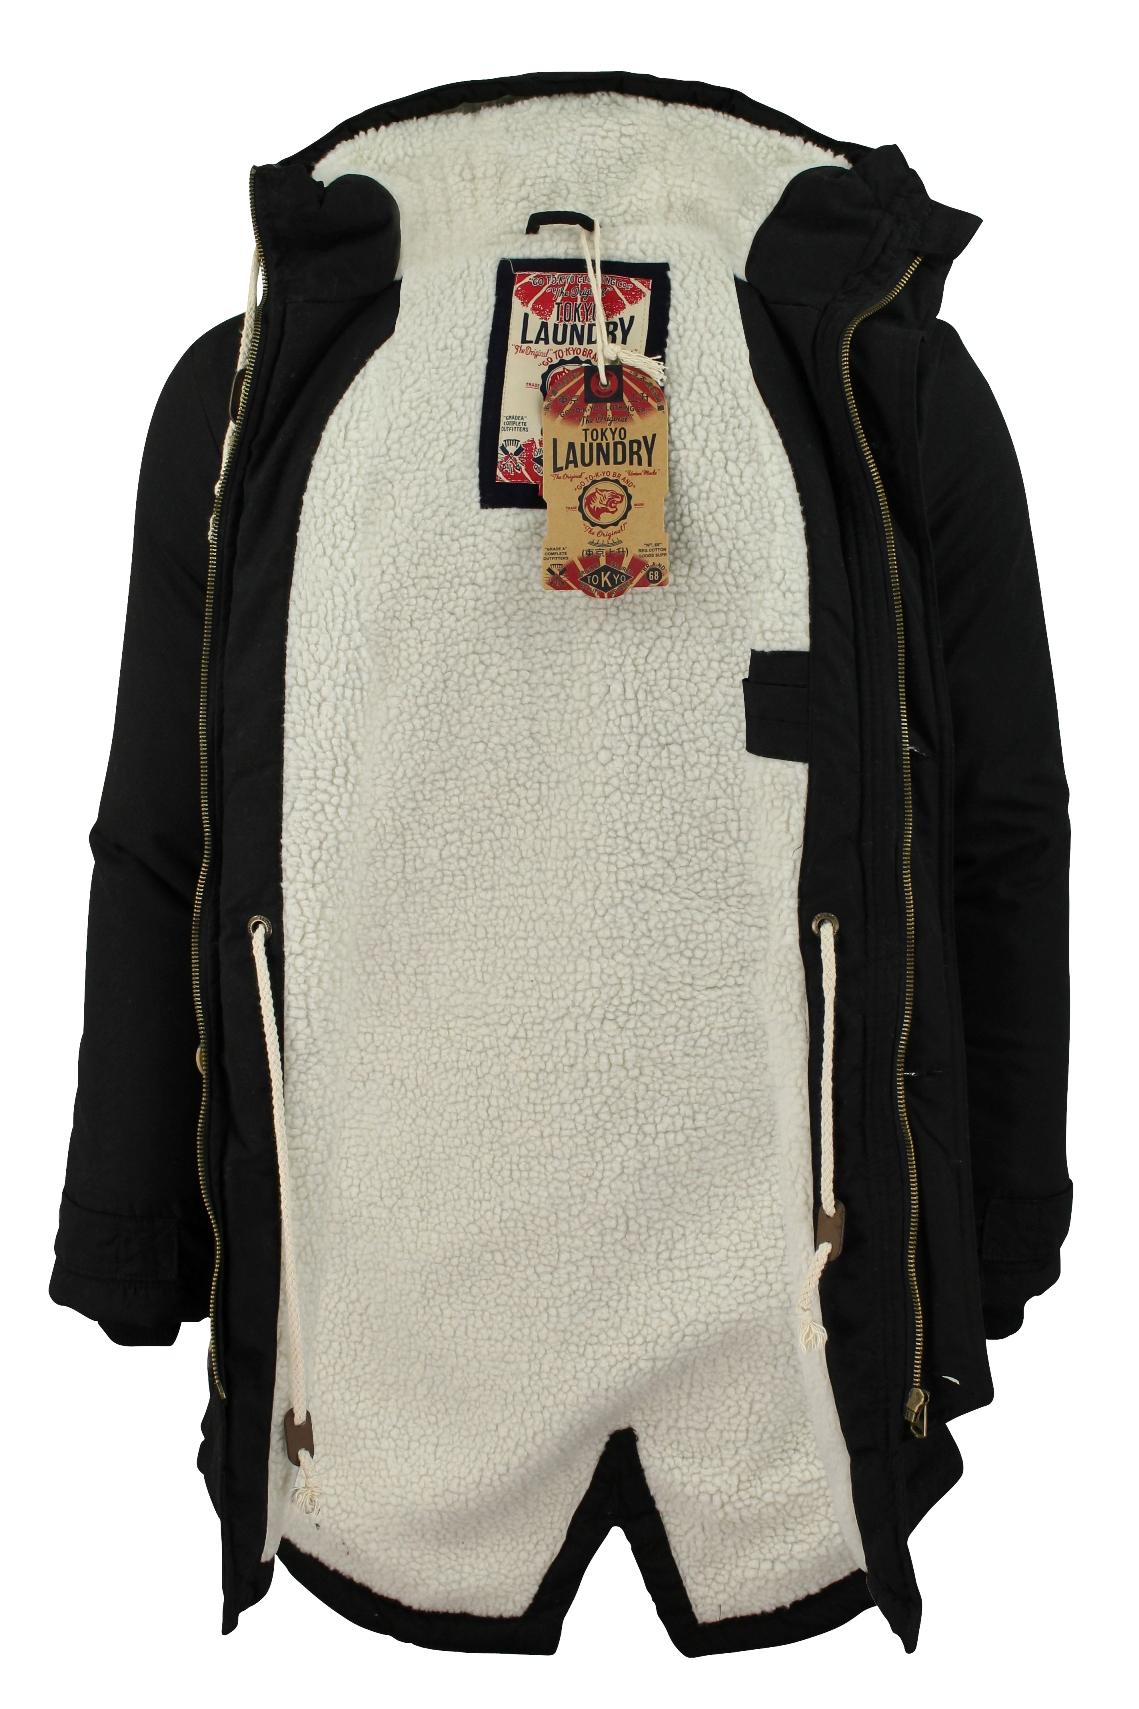 Mens Parka Jacket Tokyo Laundry  Braxton  Fishtail Snorkel Hoodie ... 518ed79a804